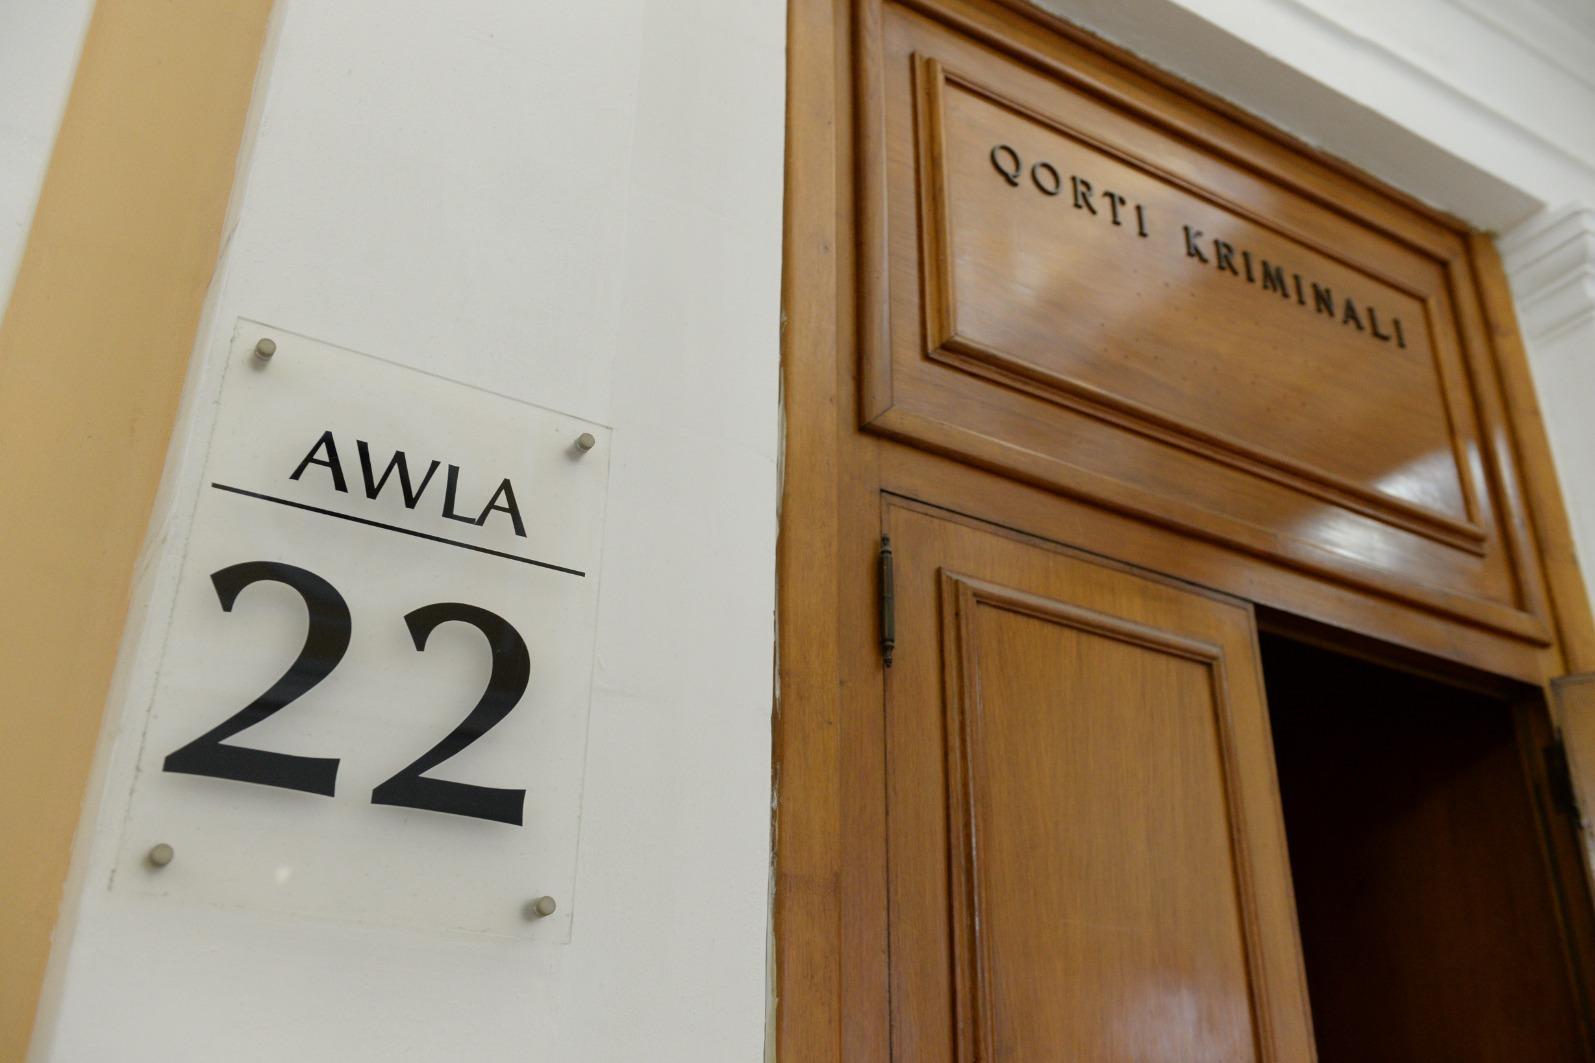 Hall 22, where Muscat registered his guilty plea. Photo: Matthew Mirabelli